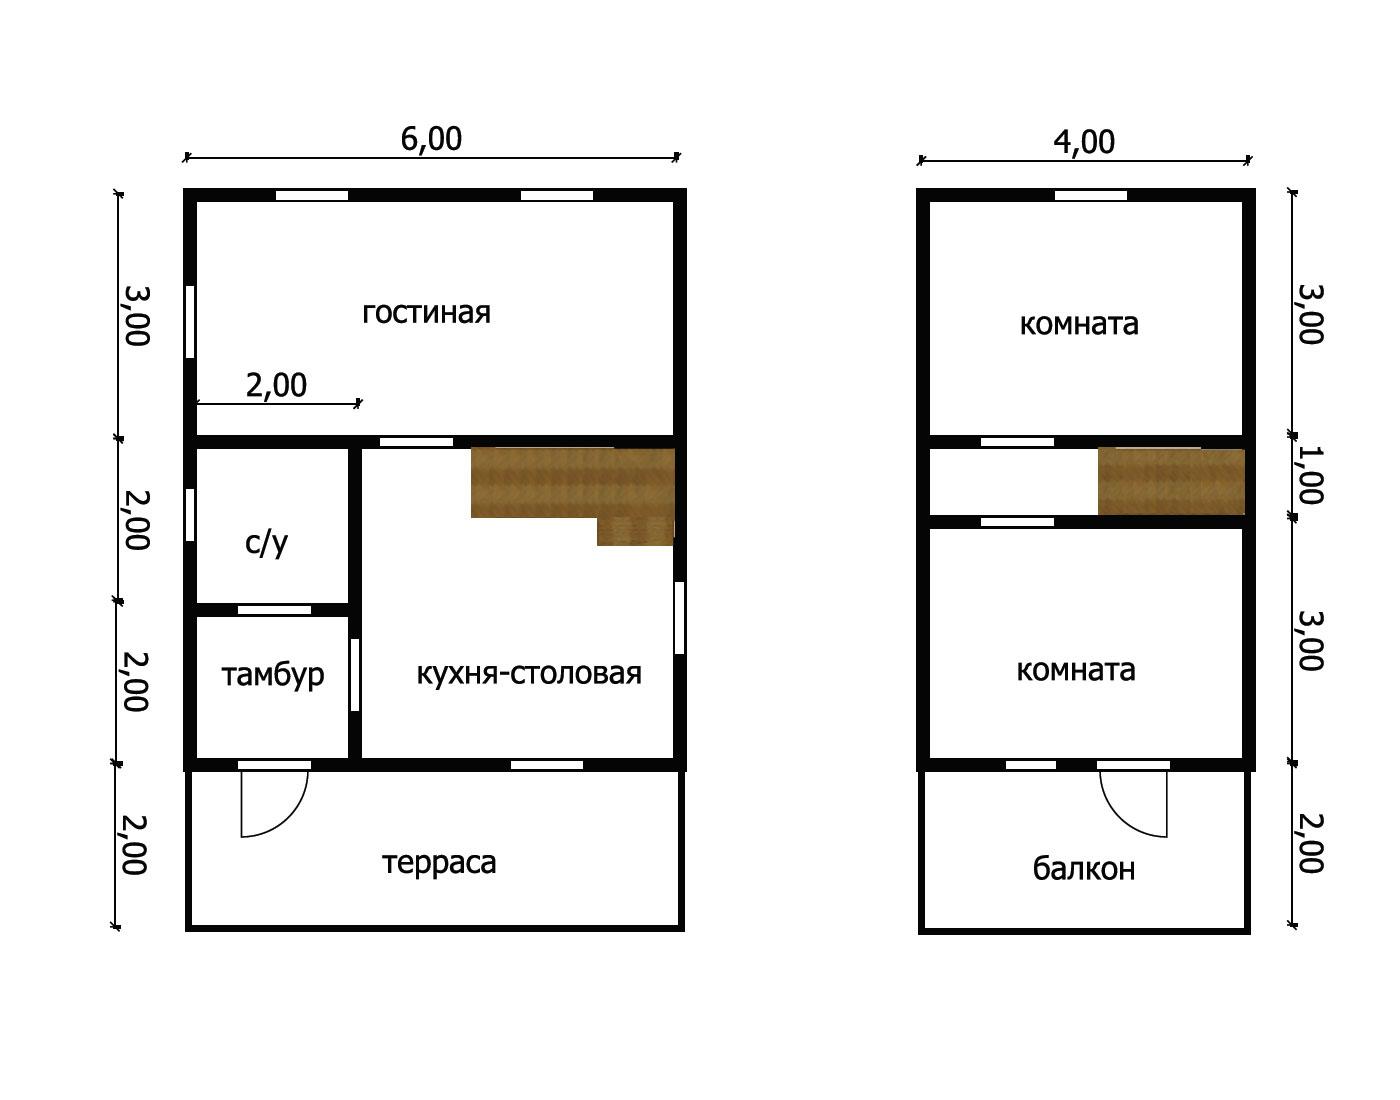 Дом из бруса под усадку 6х9 №8